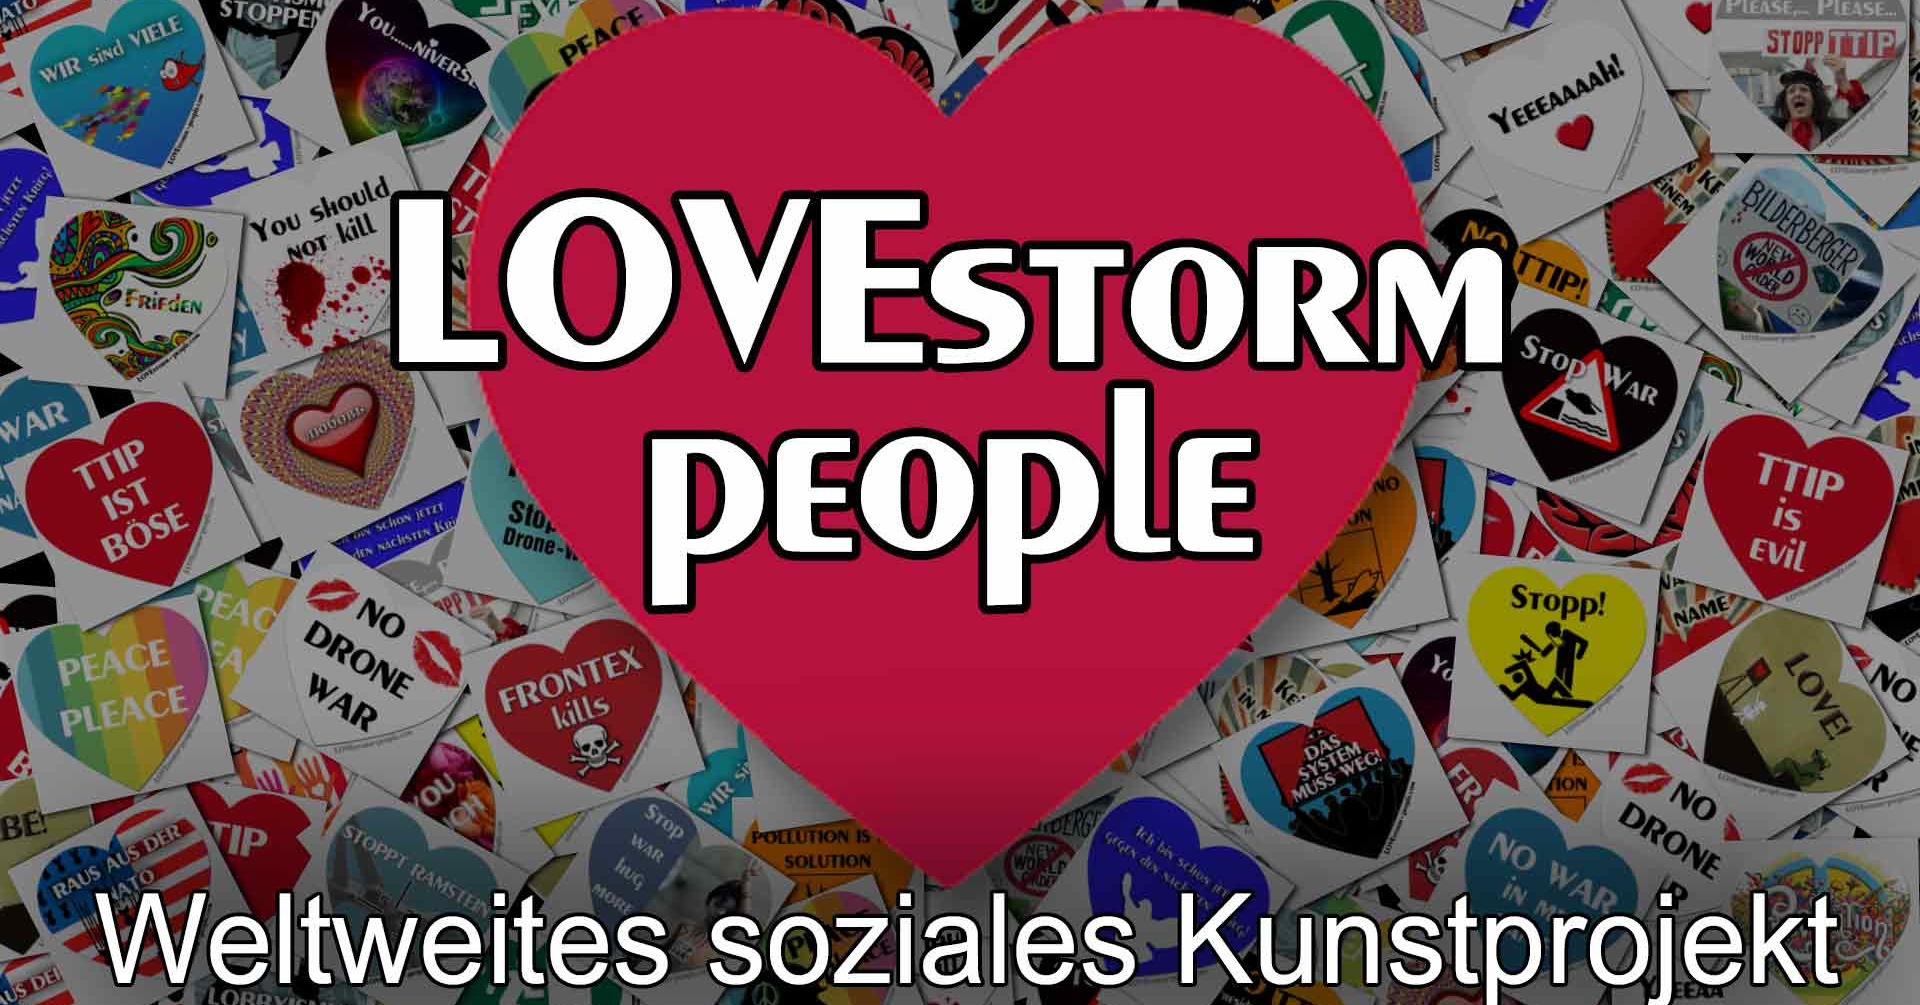 9195f8ab68 LOVE storm people ❤ Weltweites soziales Kunstprojekt ❤